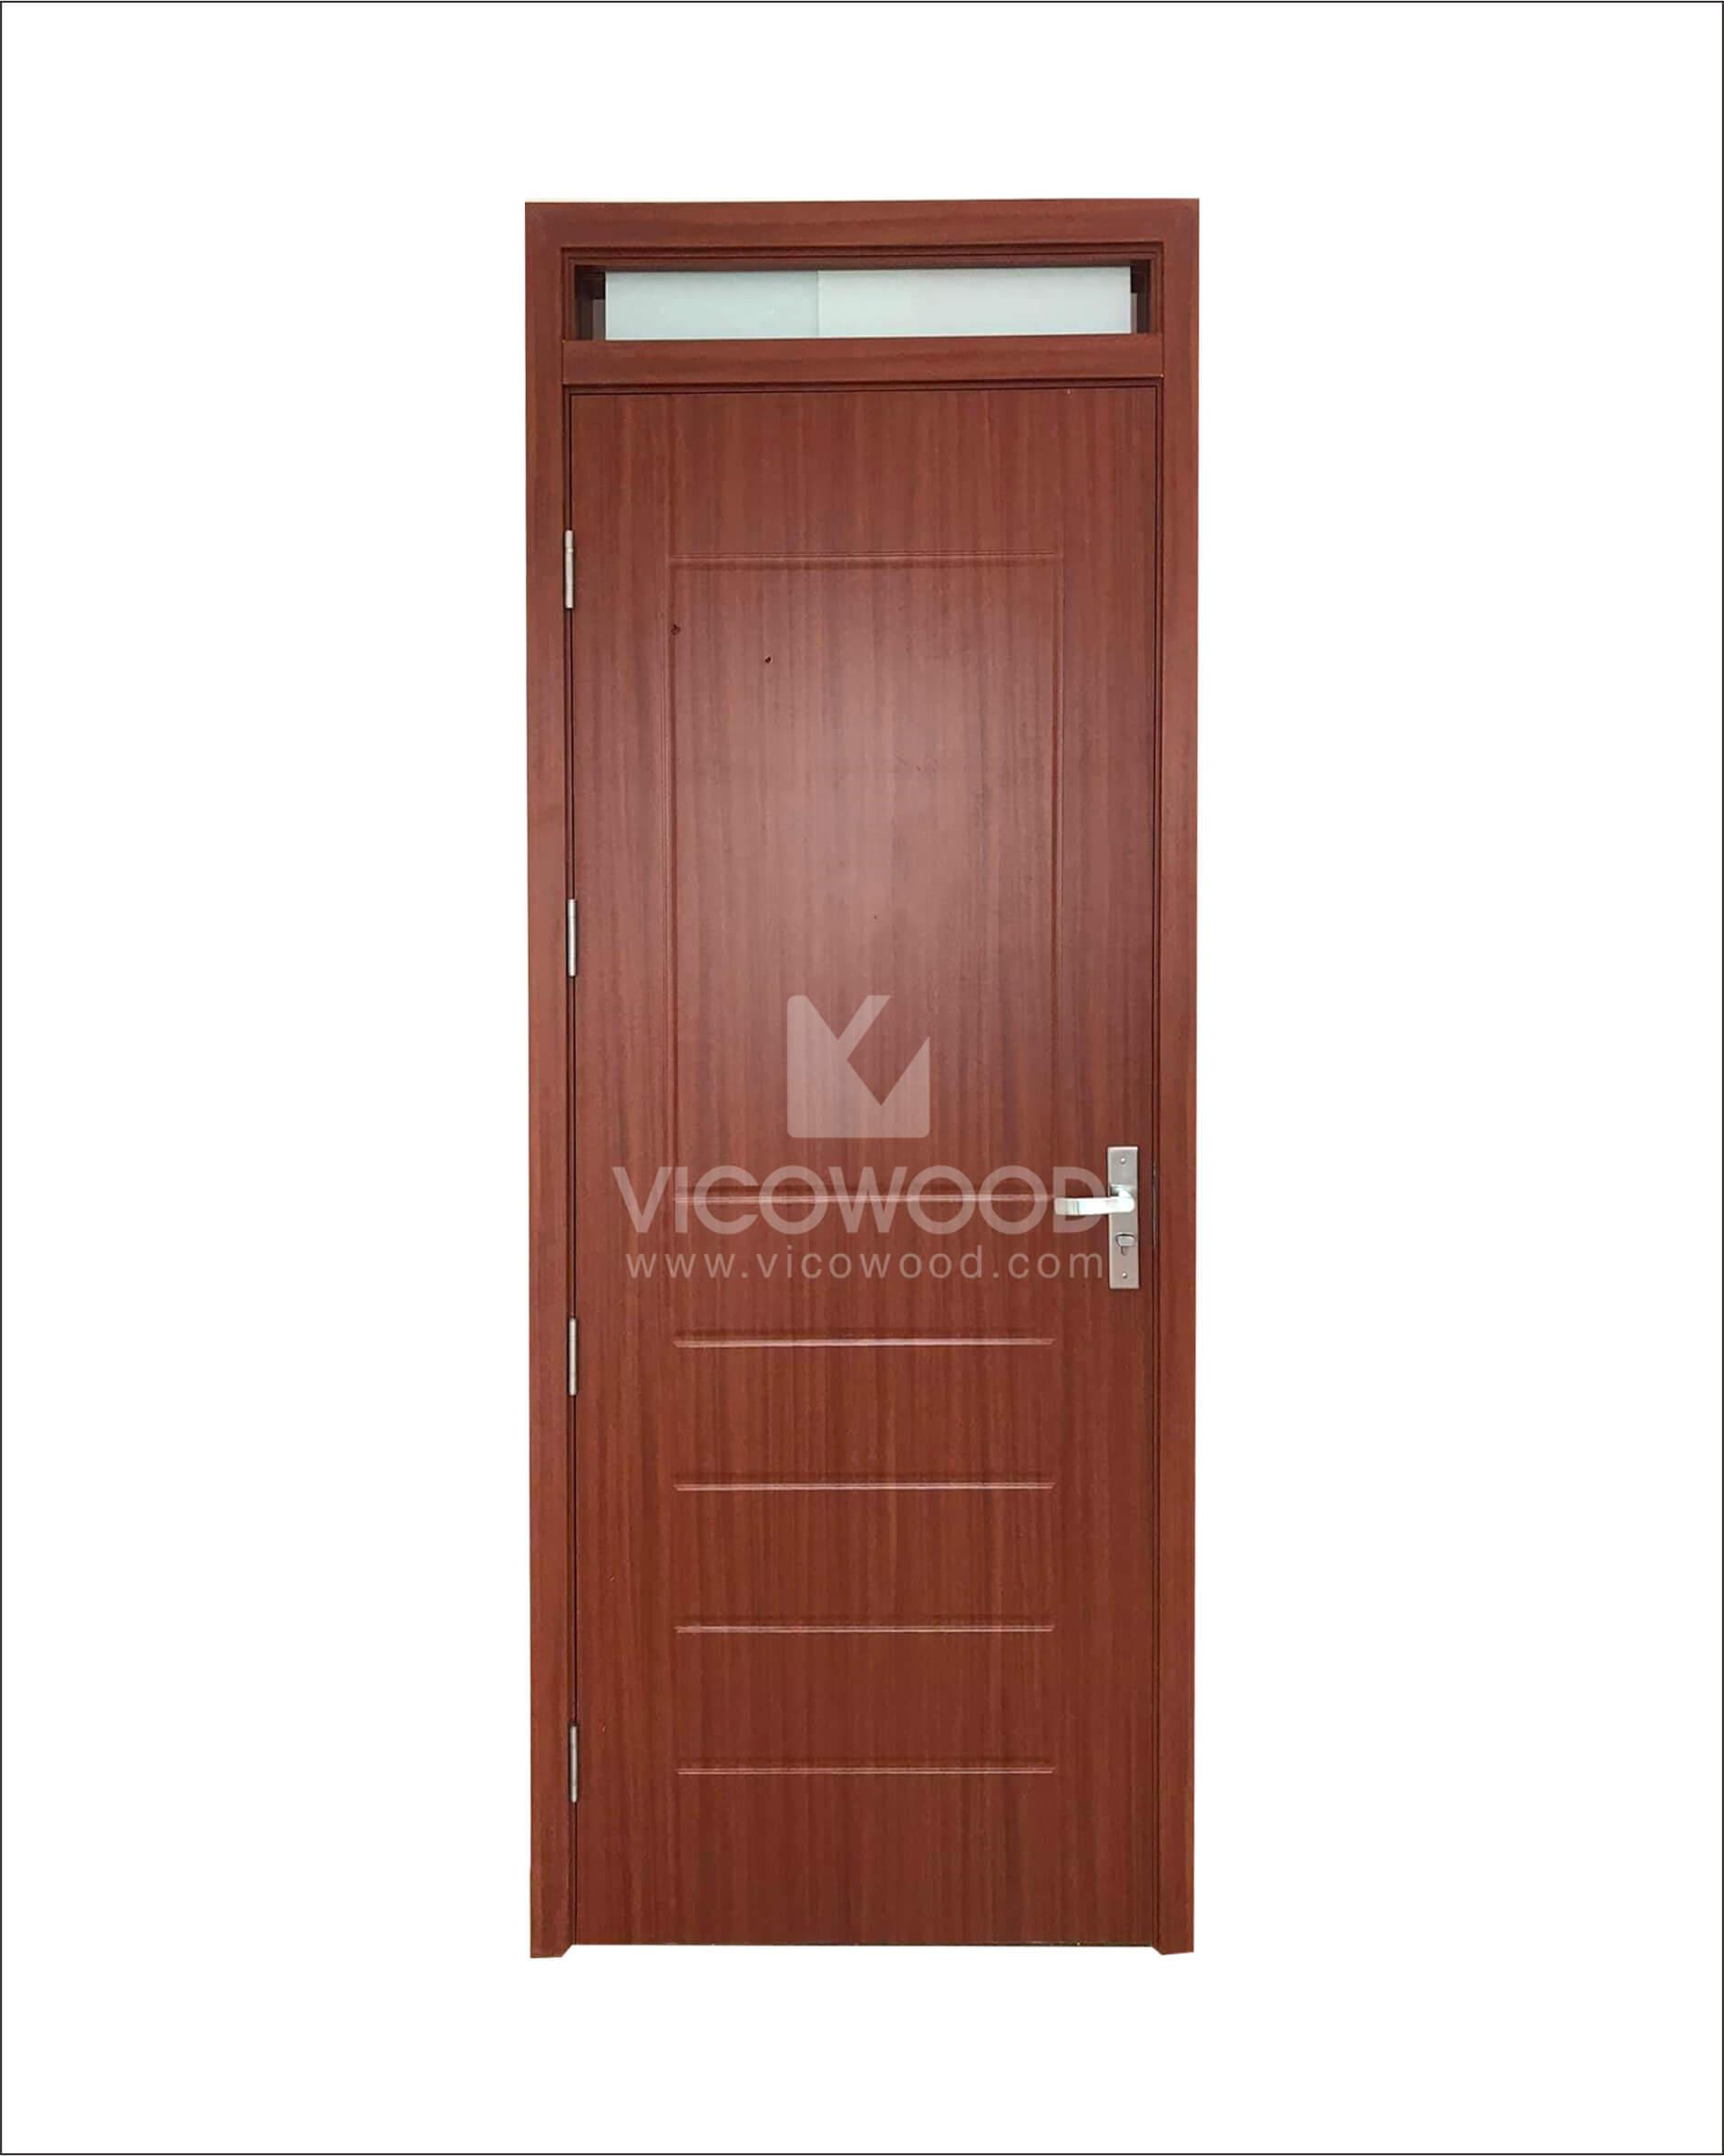 VICOWOOD-51